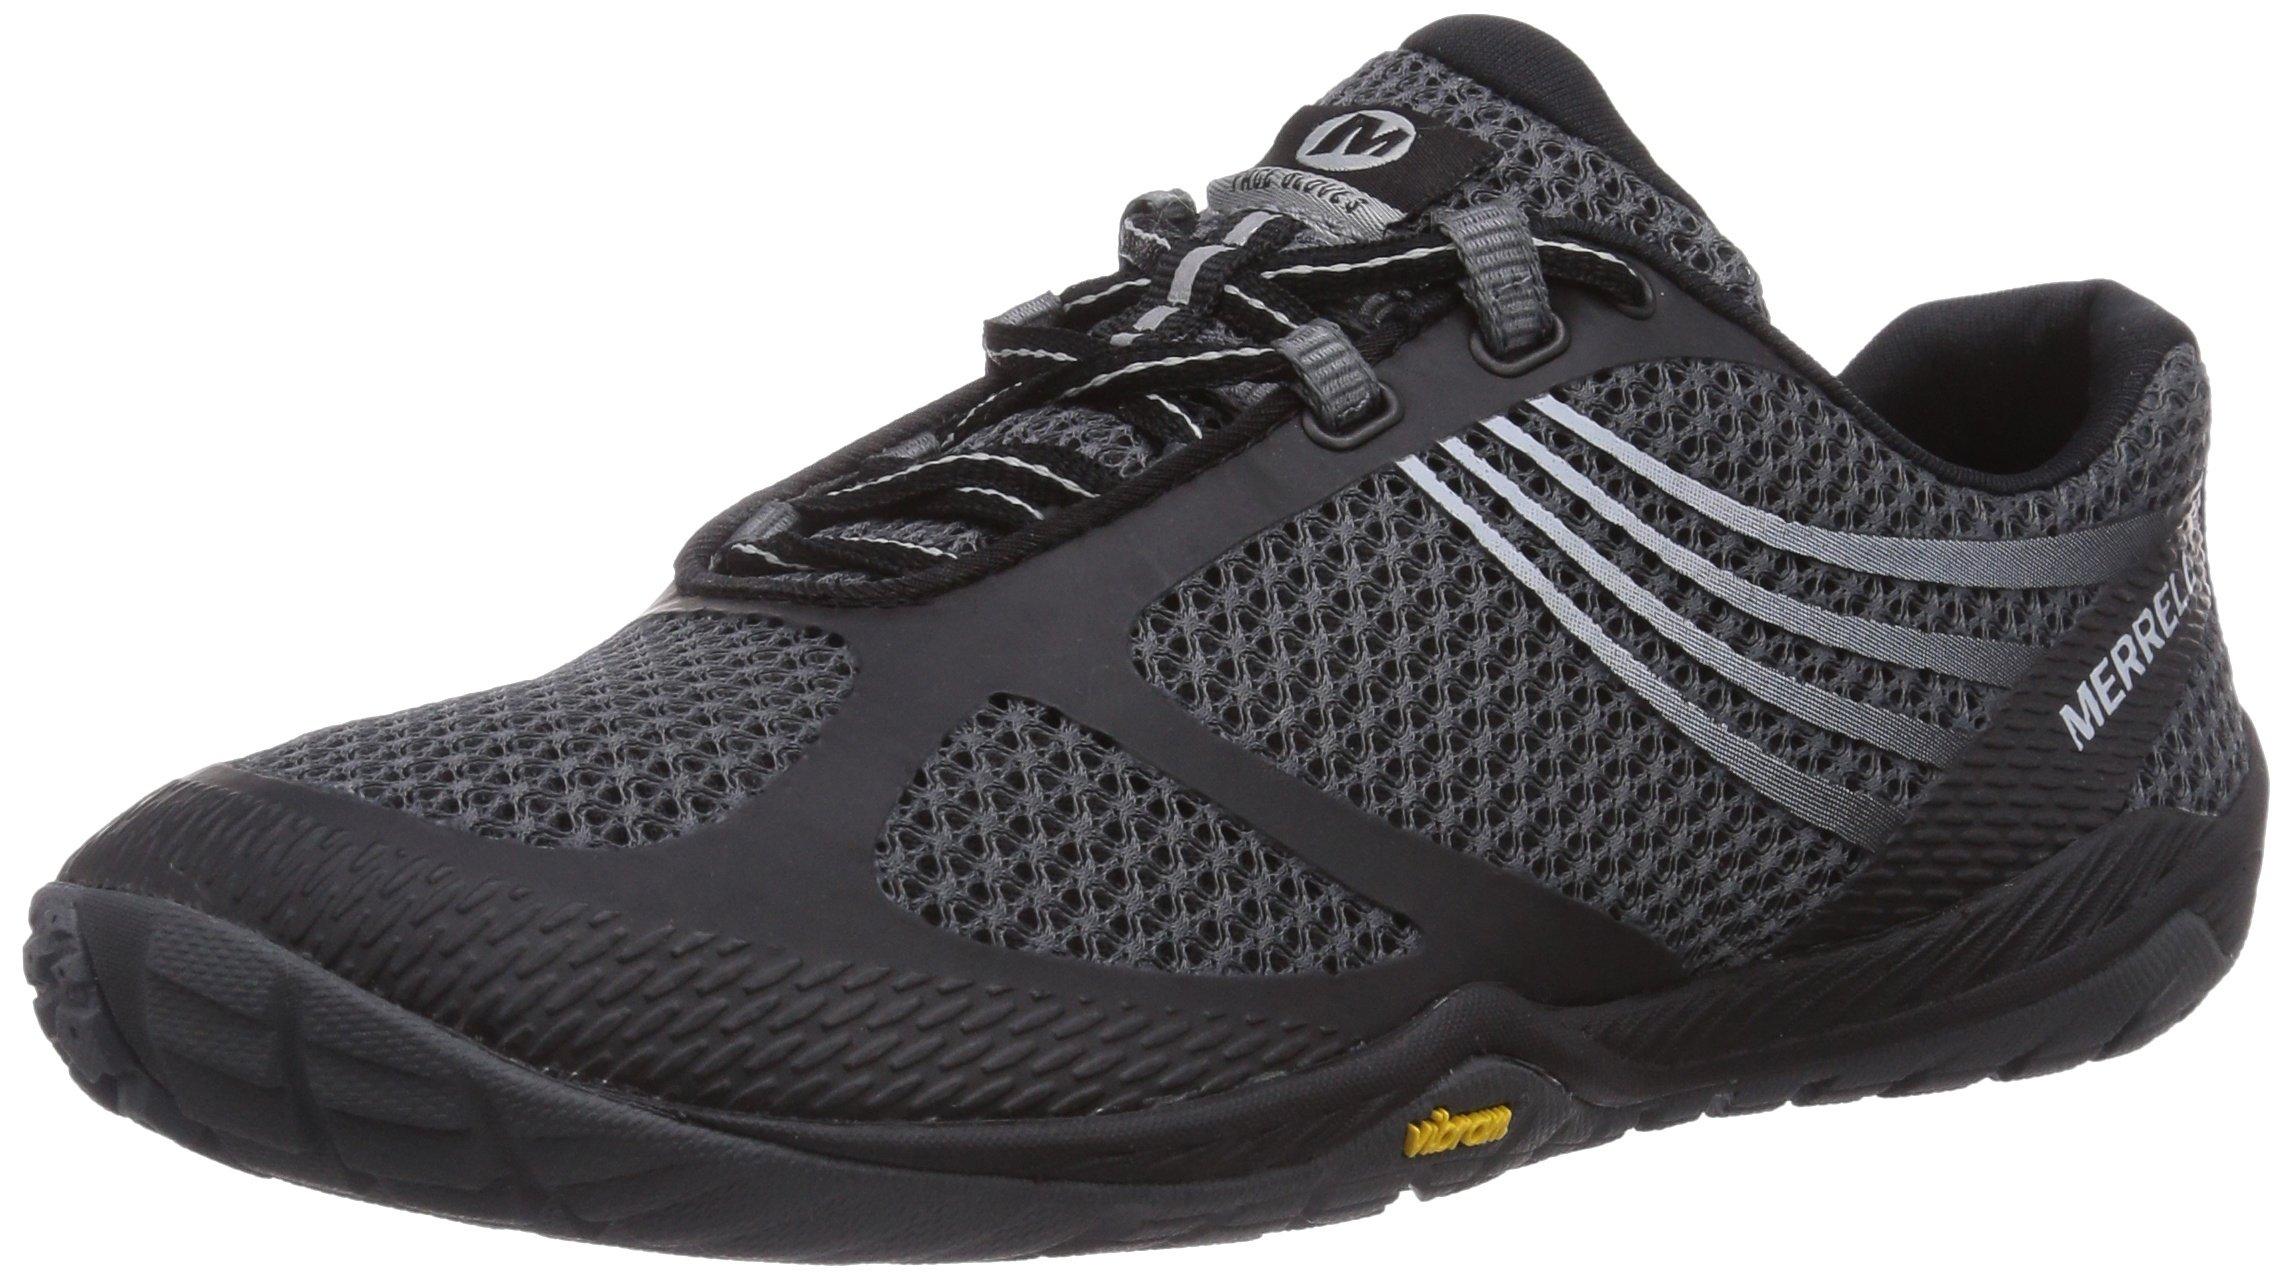 Merrell Women's Pace Glove 3 Trail Running Shoe,Black,9.5 M US